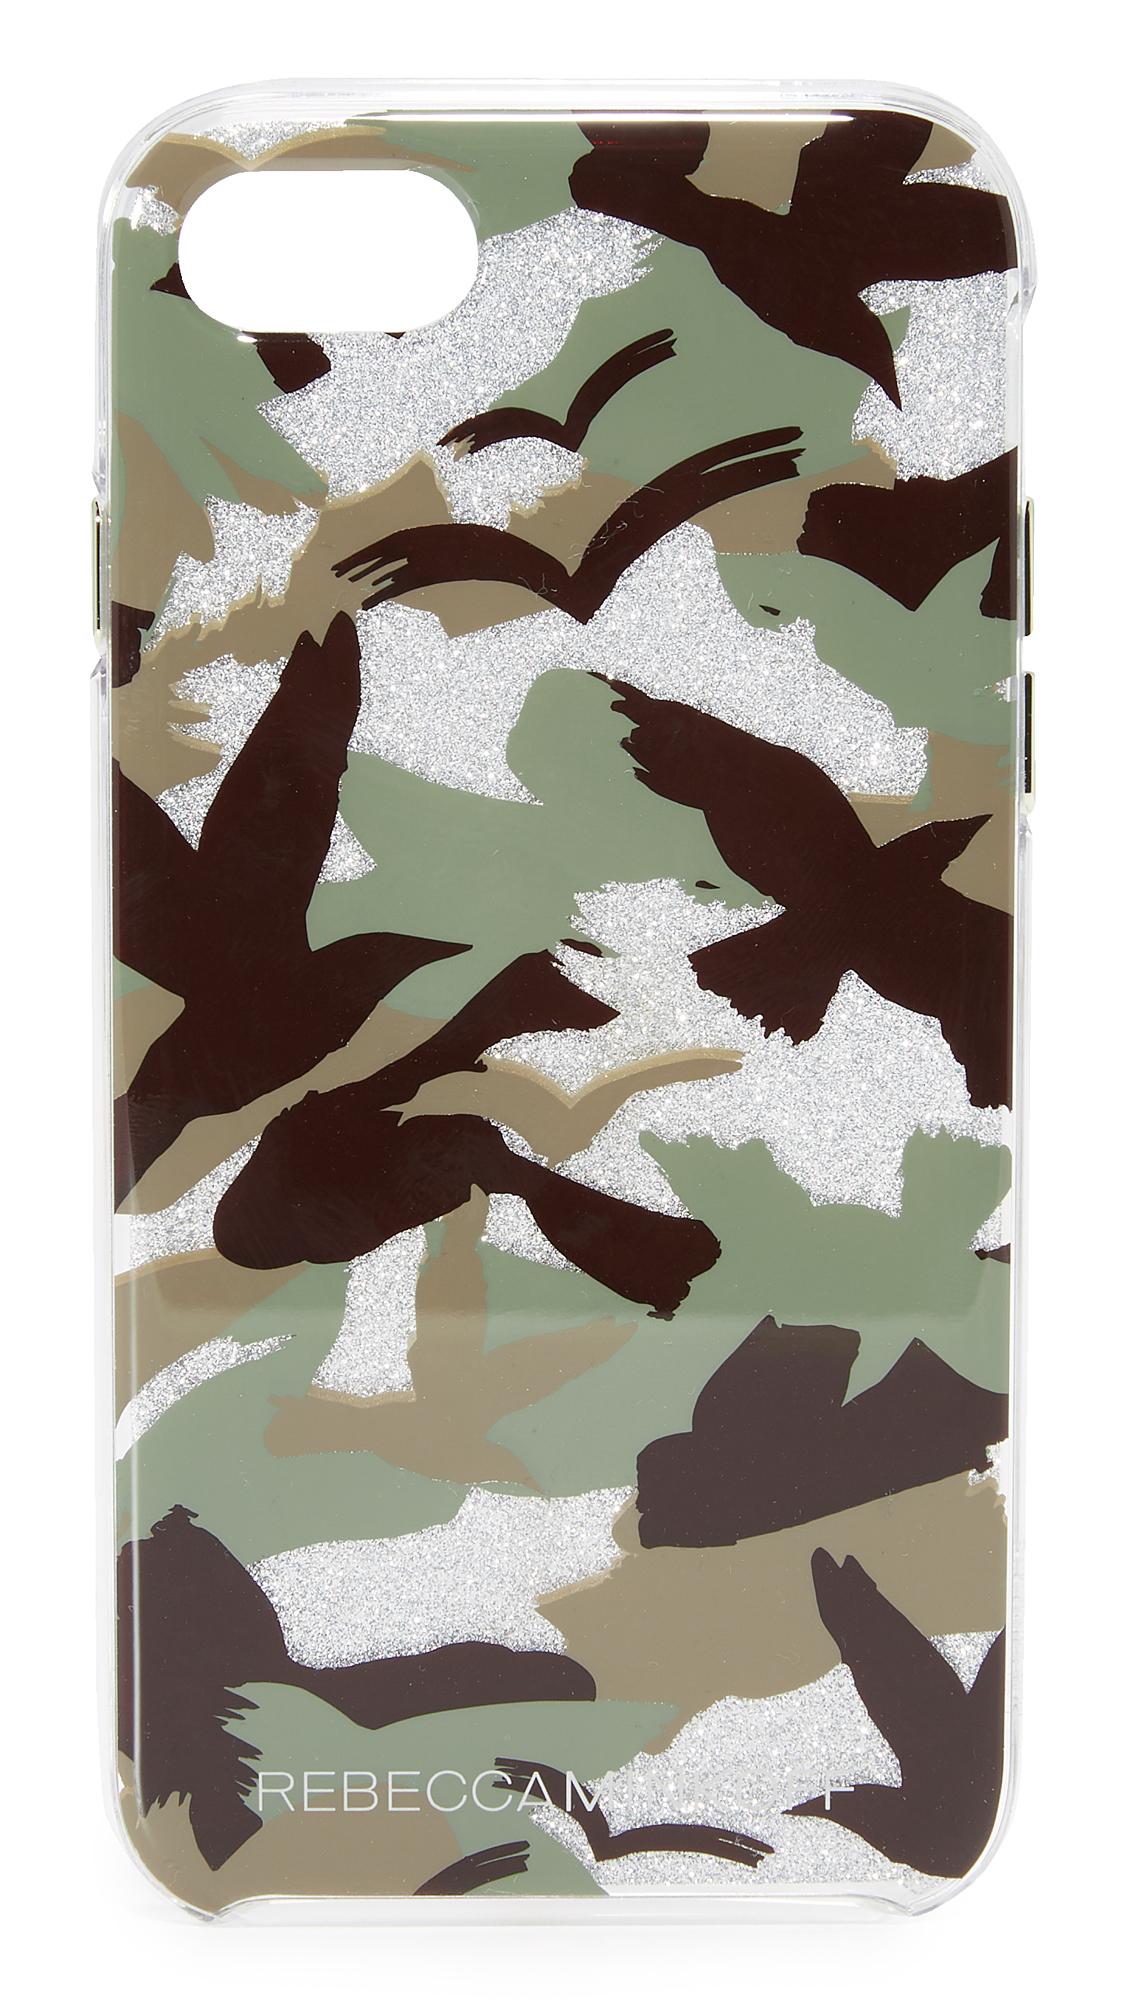 Rebecca Minkoff Camo Bird iPhone 7 Case - Green